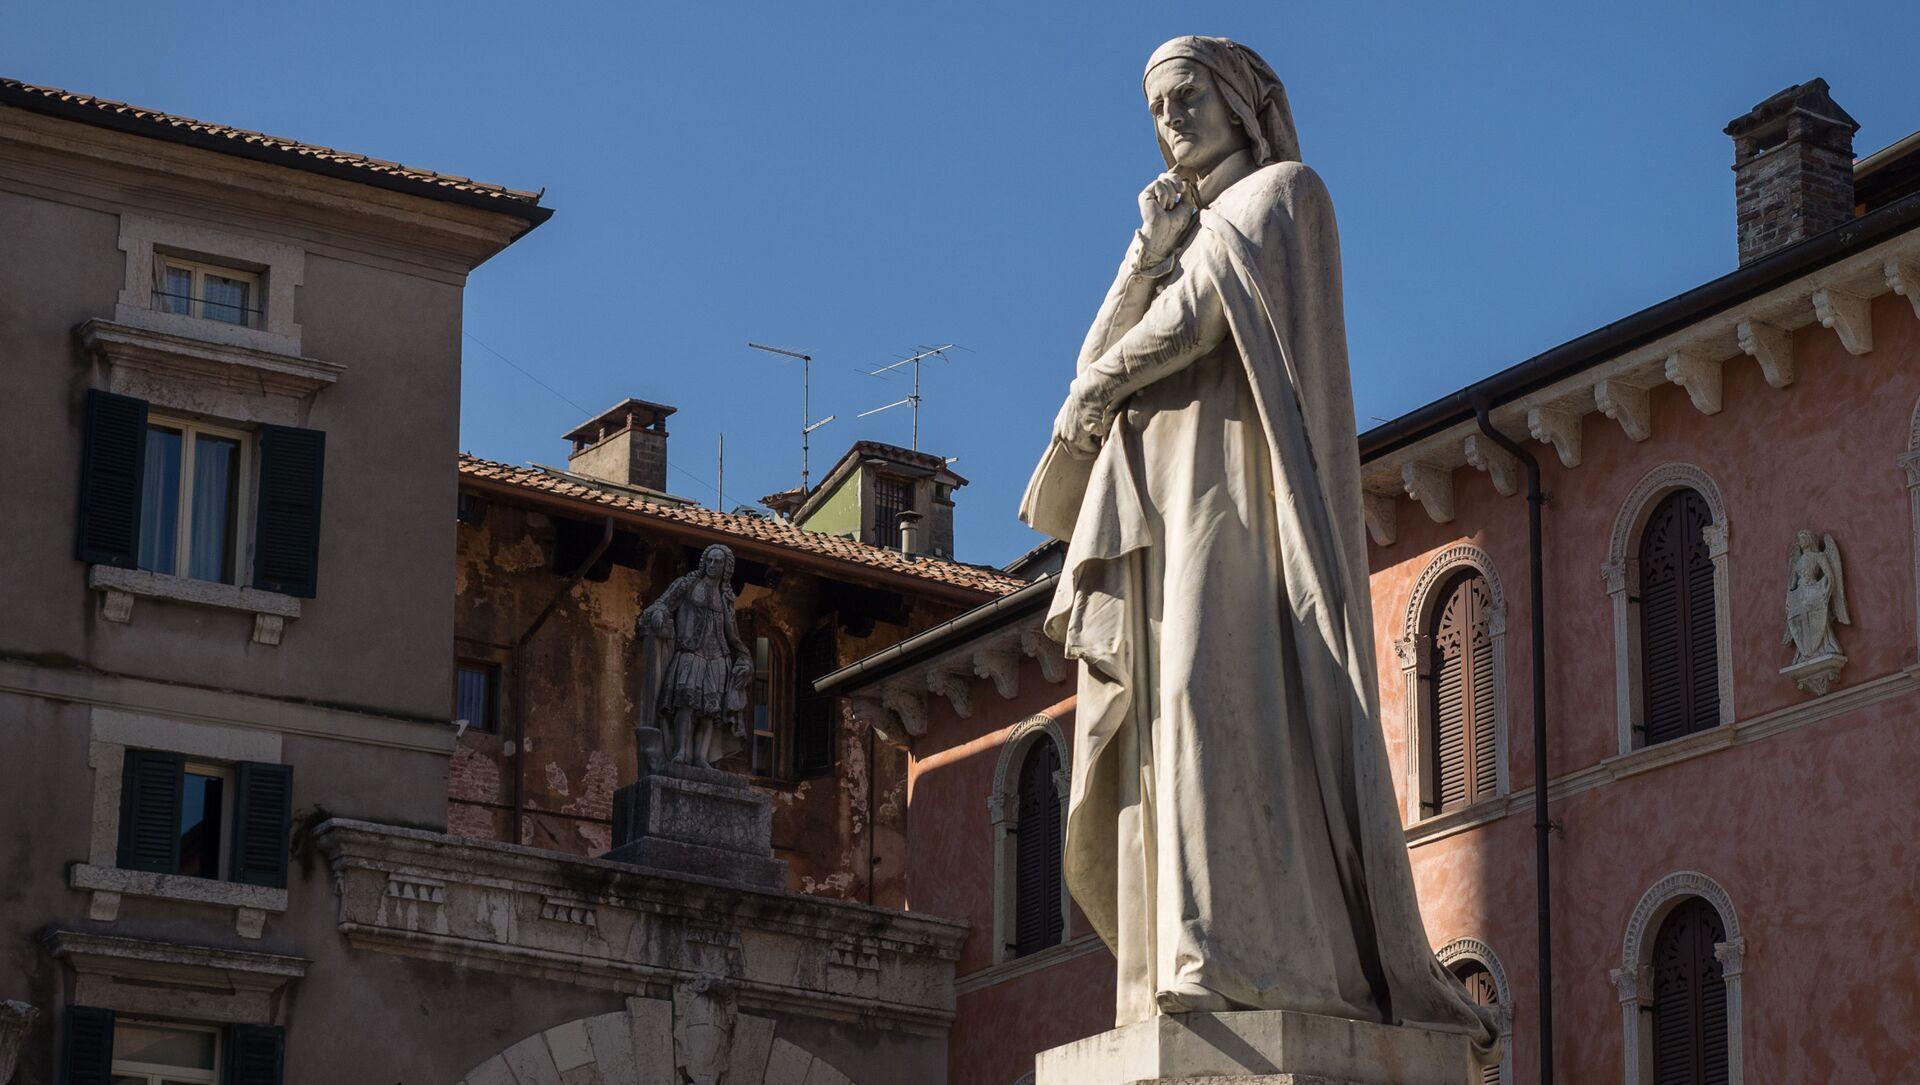 La statua di Dante a Piazza dei Signori, Verona - Sputnik Italia, 1920, 31.03.2021